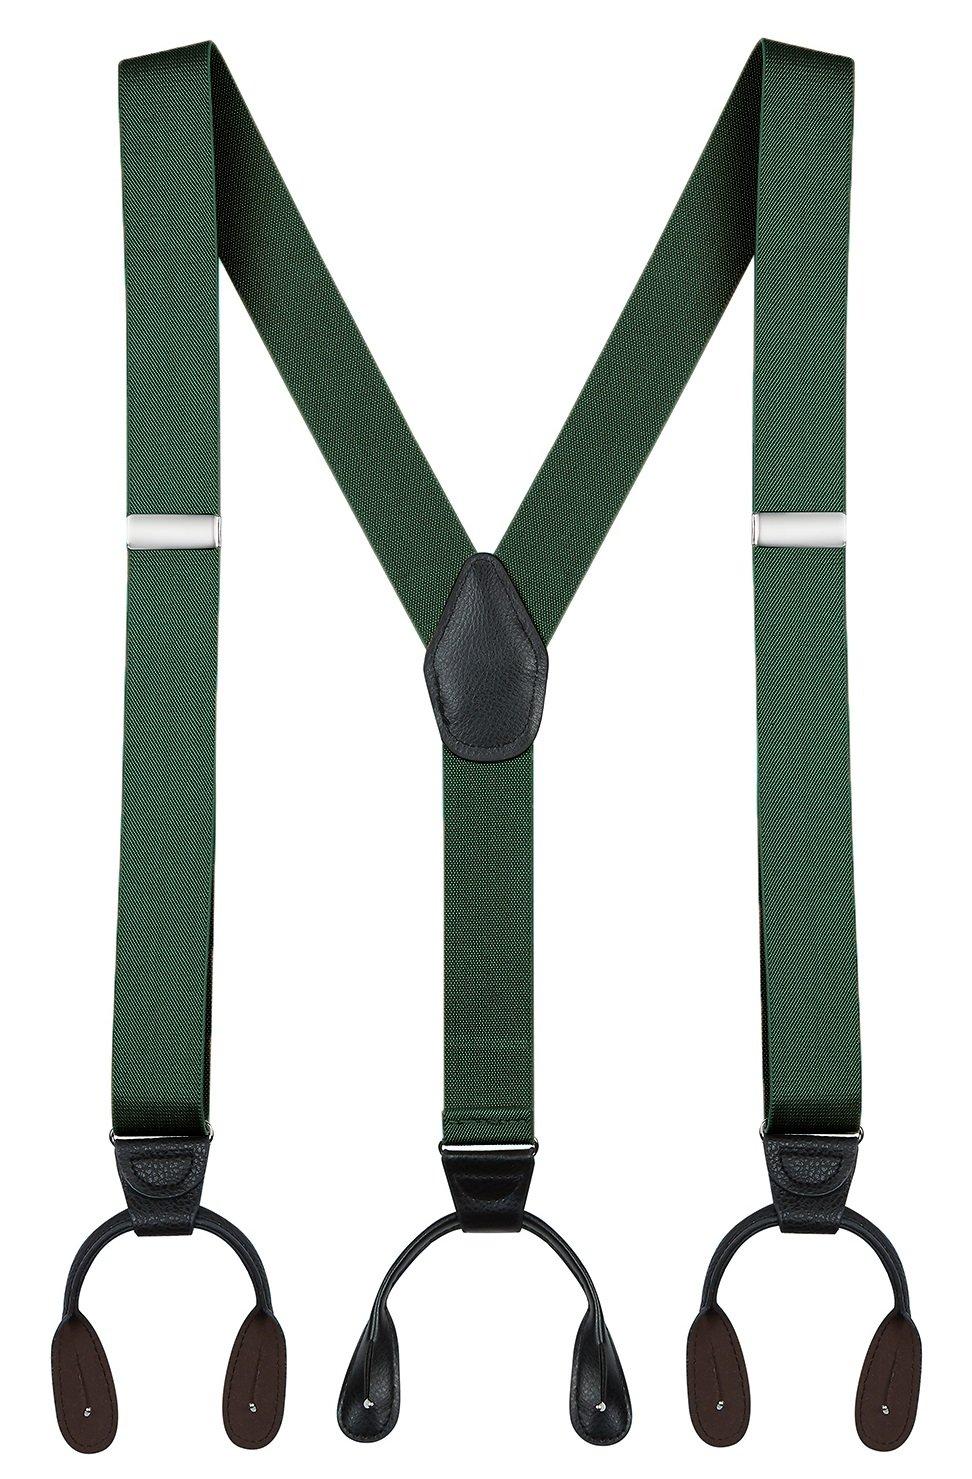 "Buyless Fashion 48'' Men's Elastic Adjustable 1 1/4"" Y Back Suspender Button End-Hunter Green 5113"